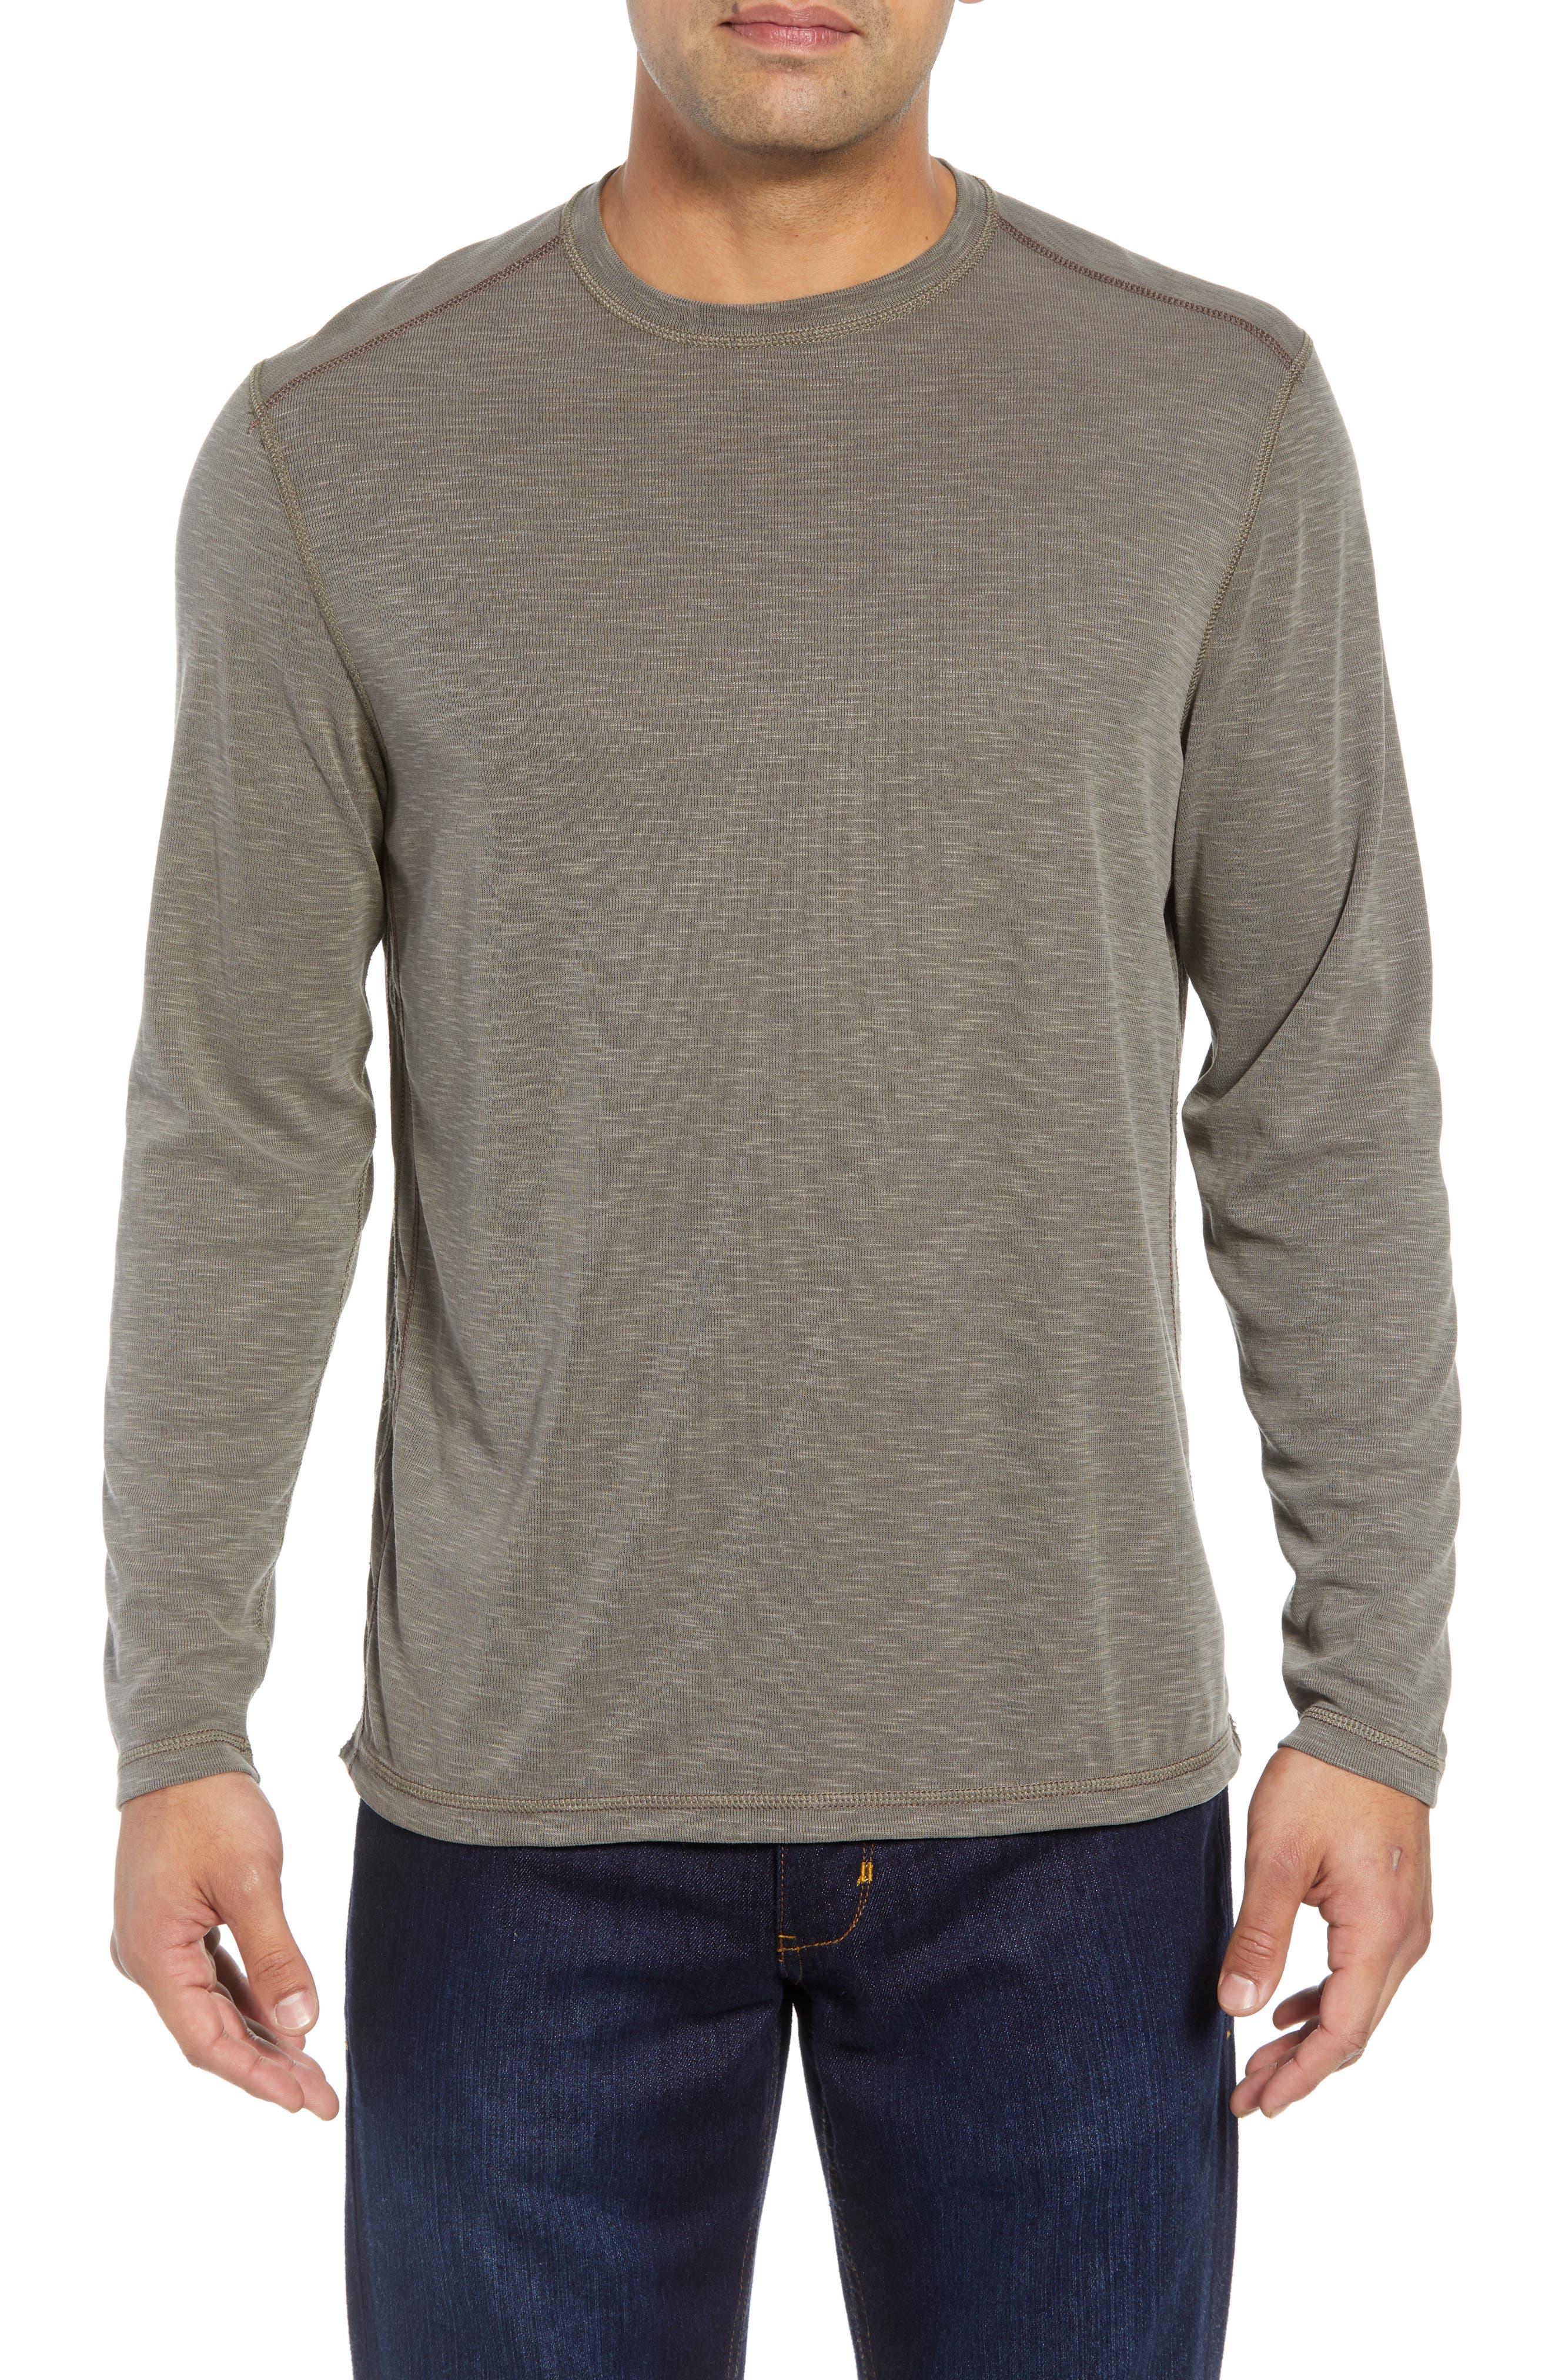 Flip Tide Standard Fit T-Shirt,                         Main,                         color, BITTERSWEET CHOCOLATE